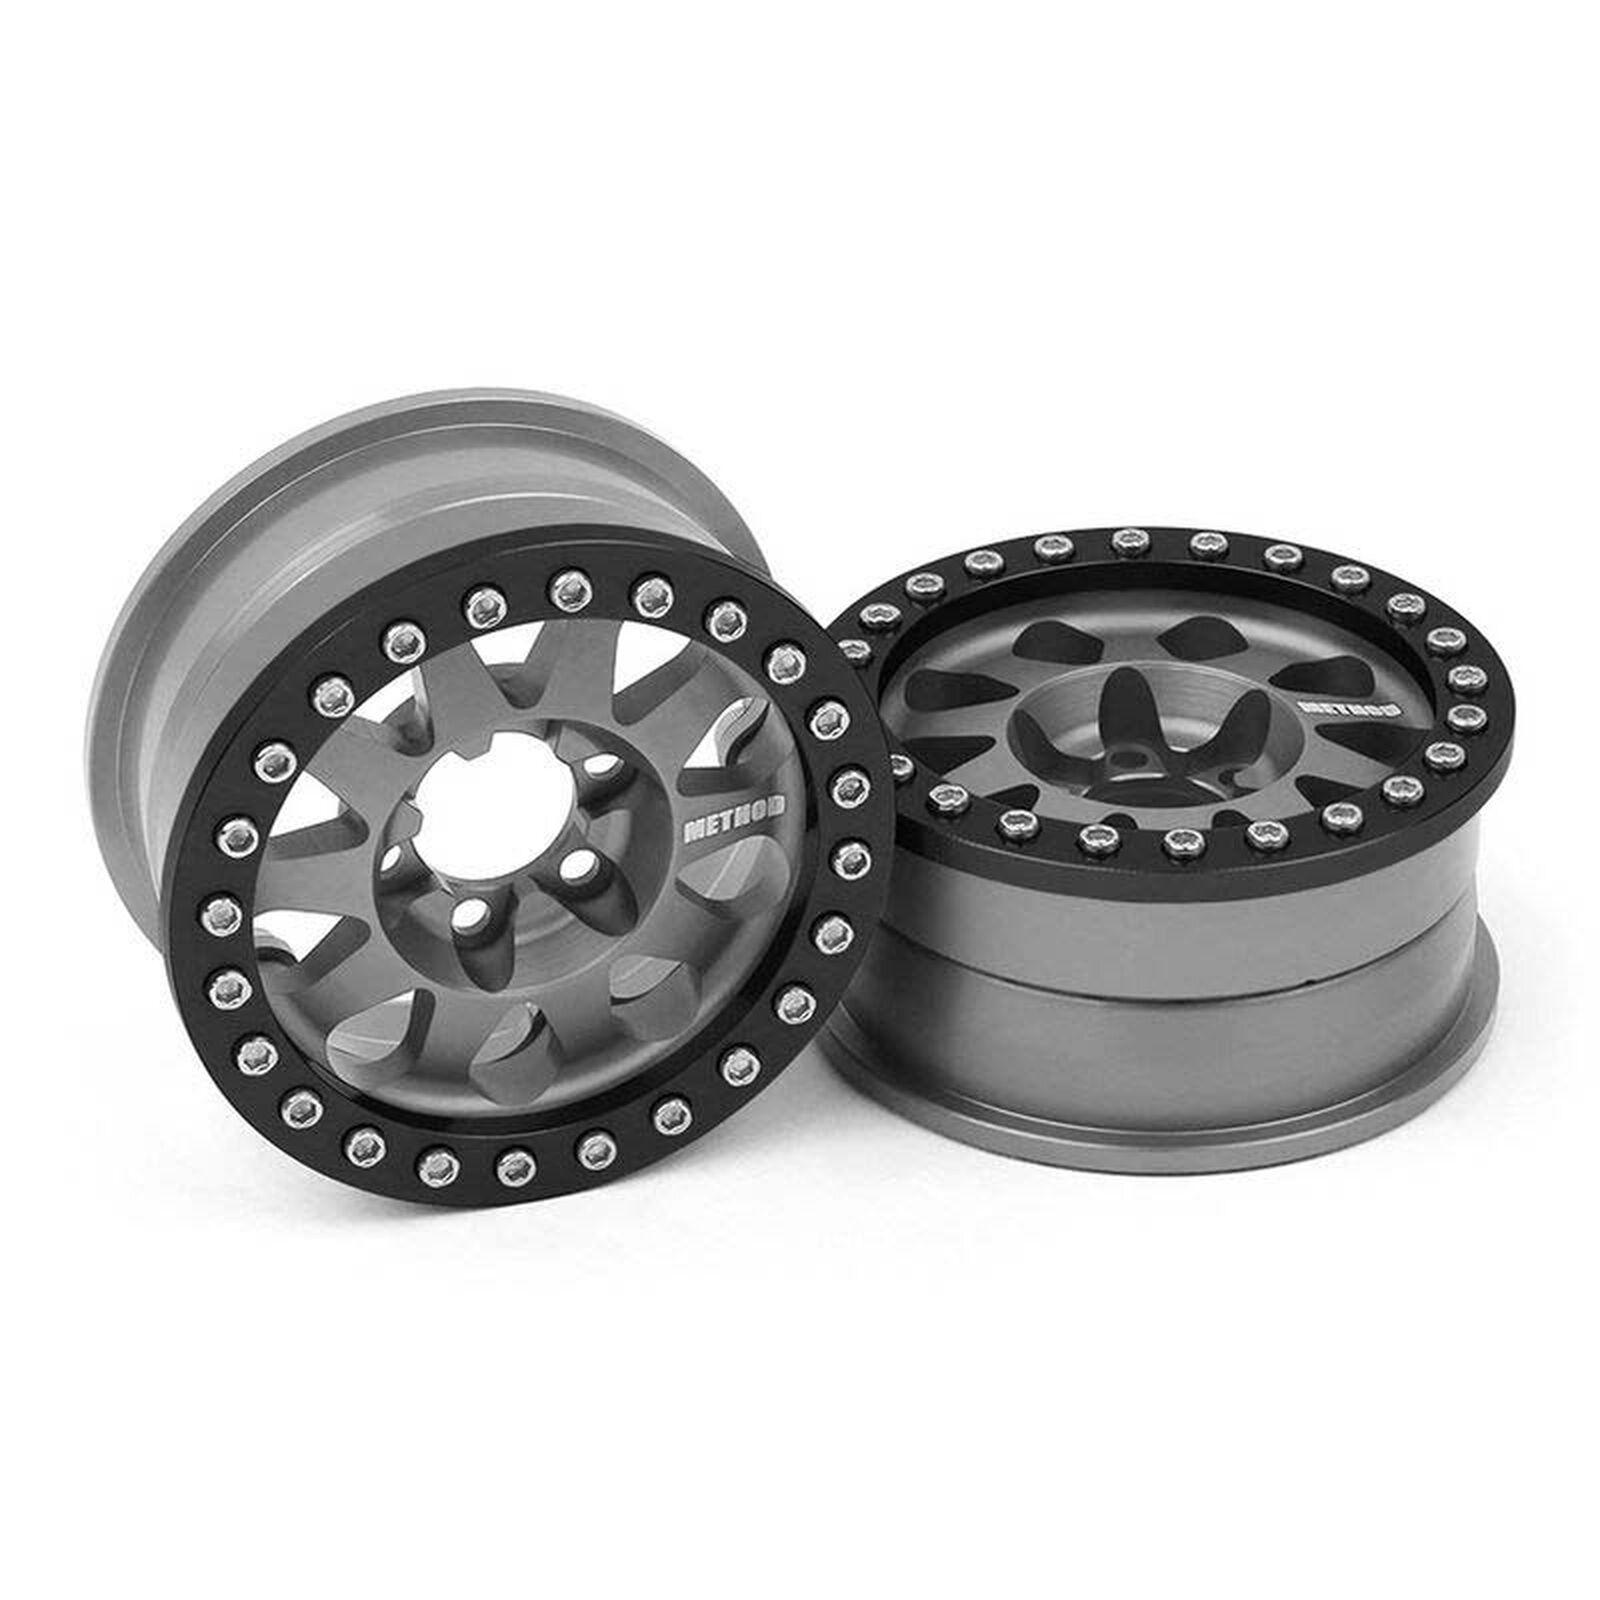 Method 1.9 Race Wheel 101, Grey Anodized V2